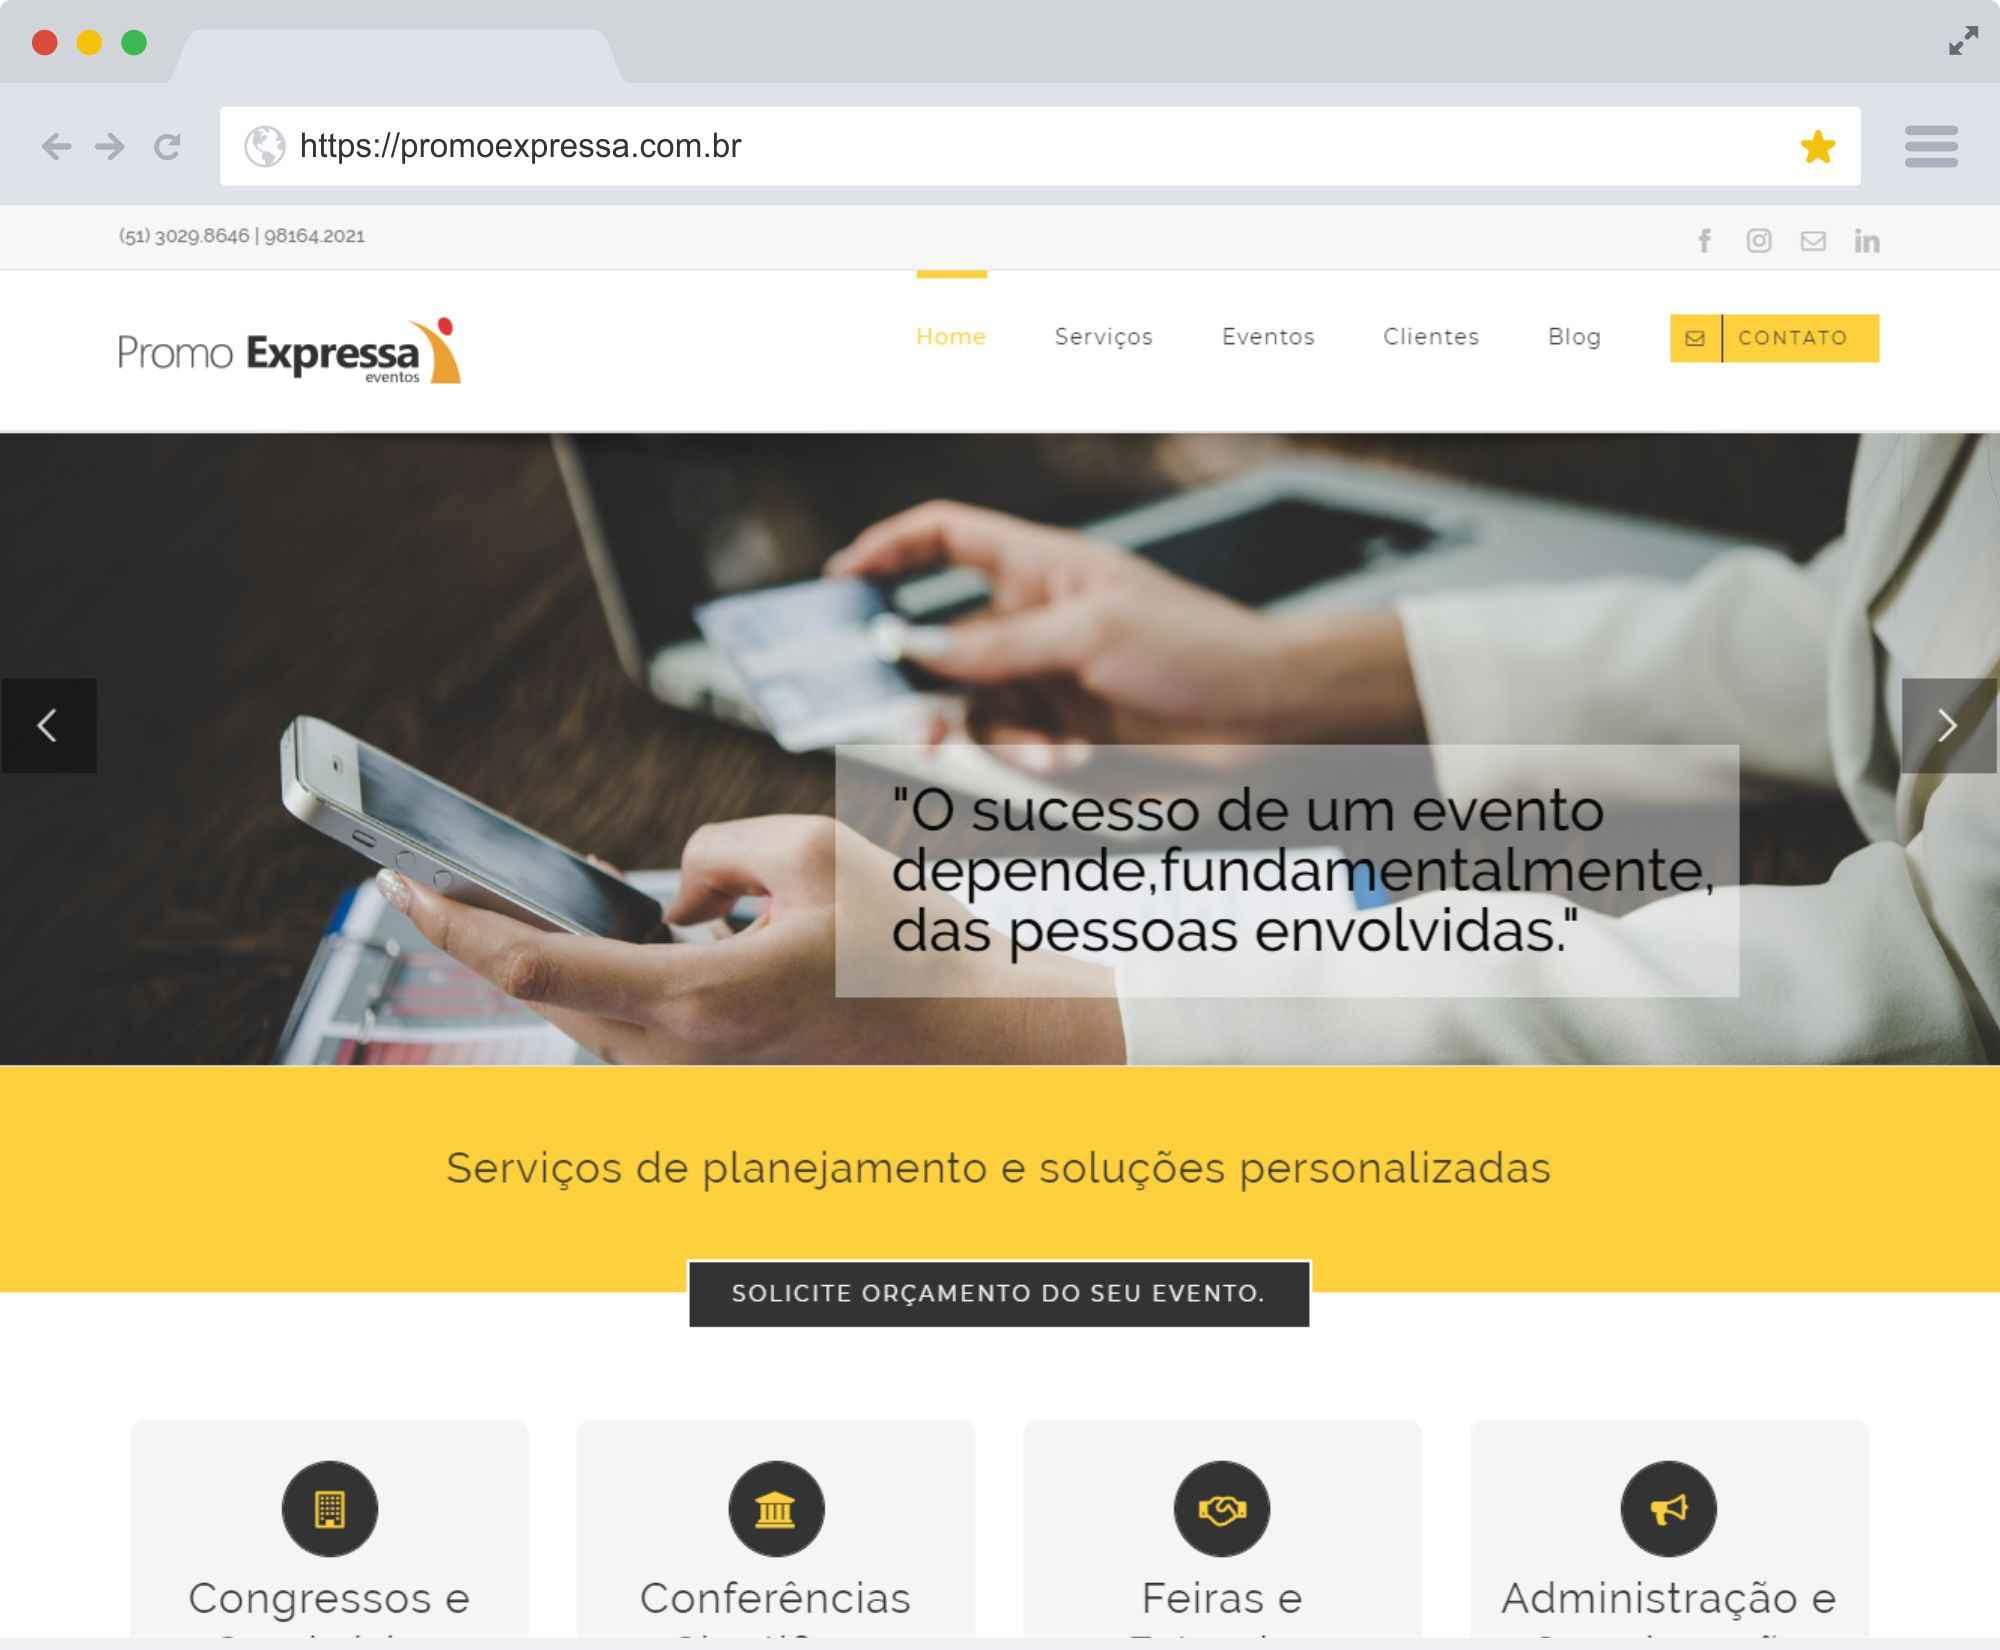 promoexpressa.com.br